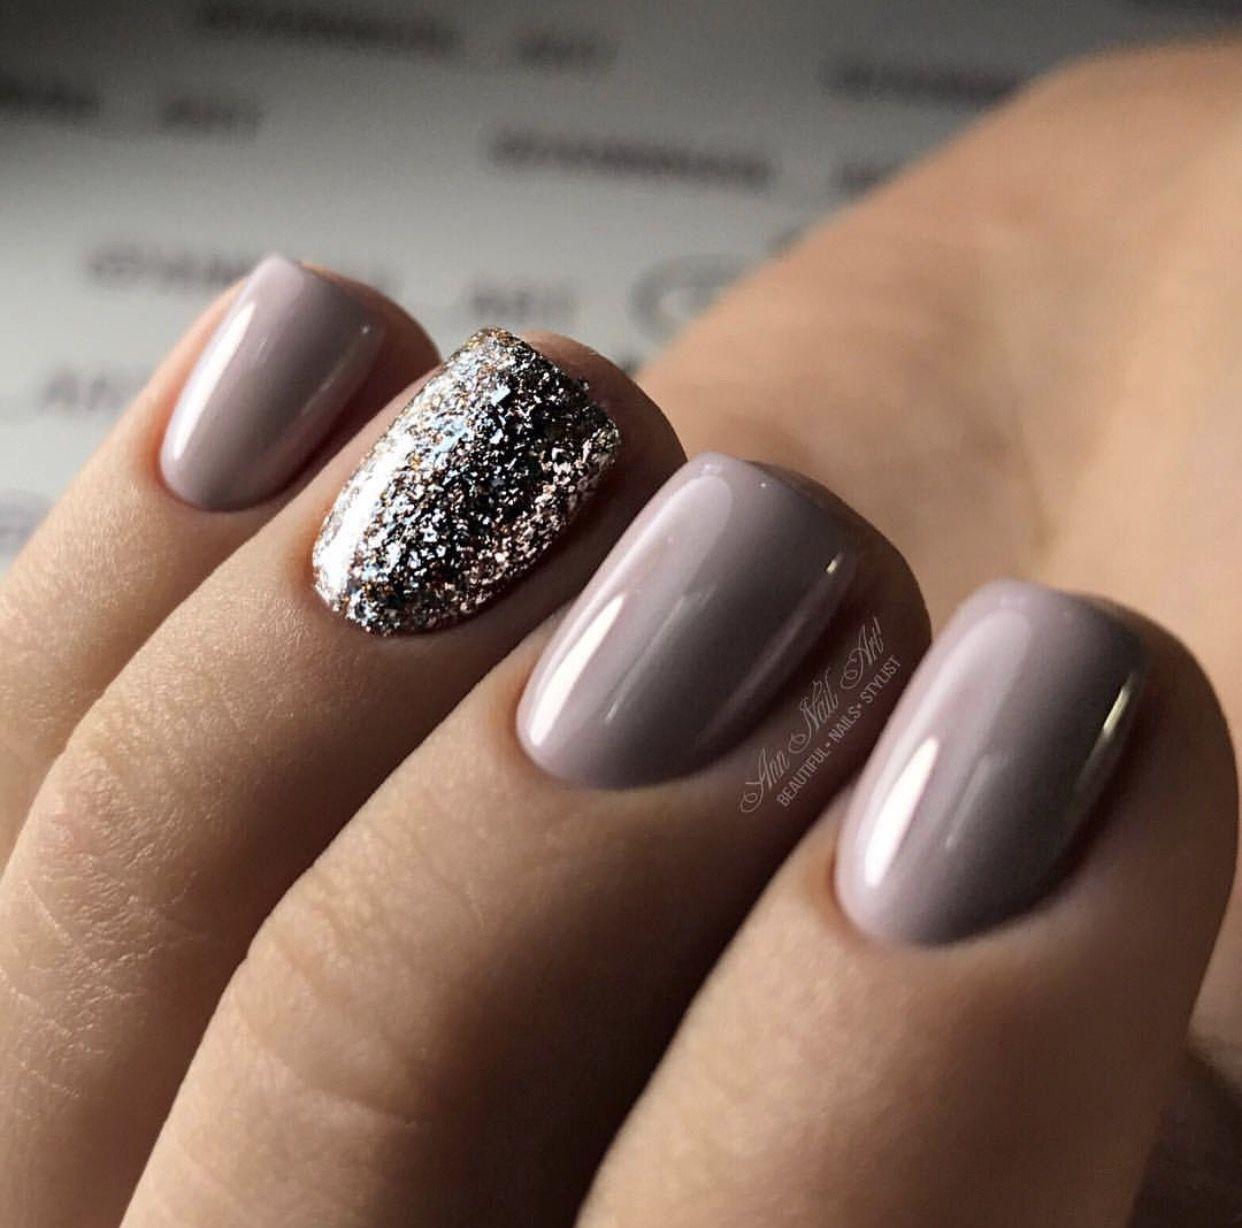 Pin by stephanie alexus garcia on nails pinterest makeup hair